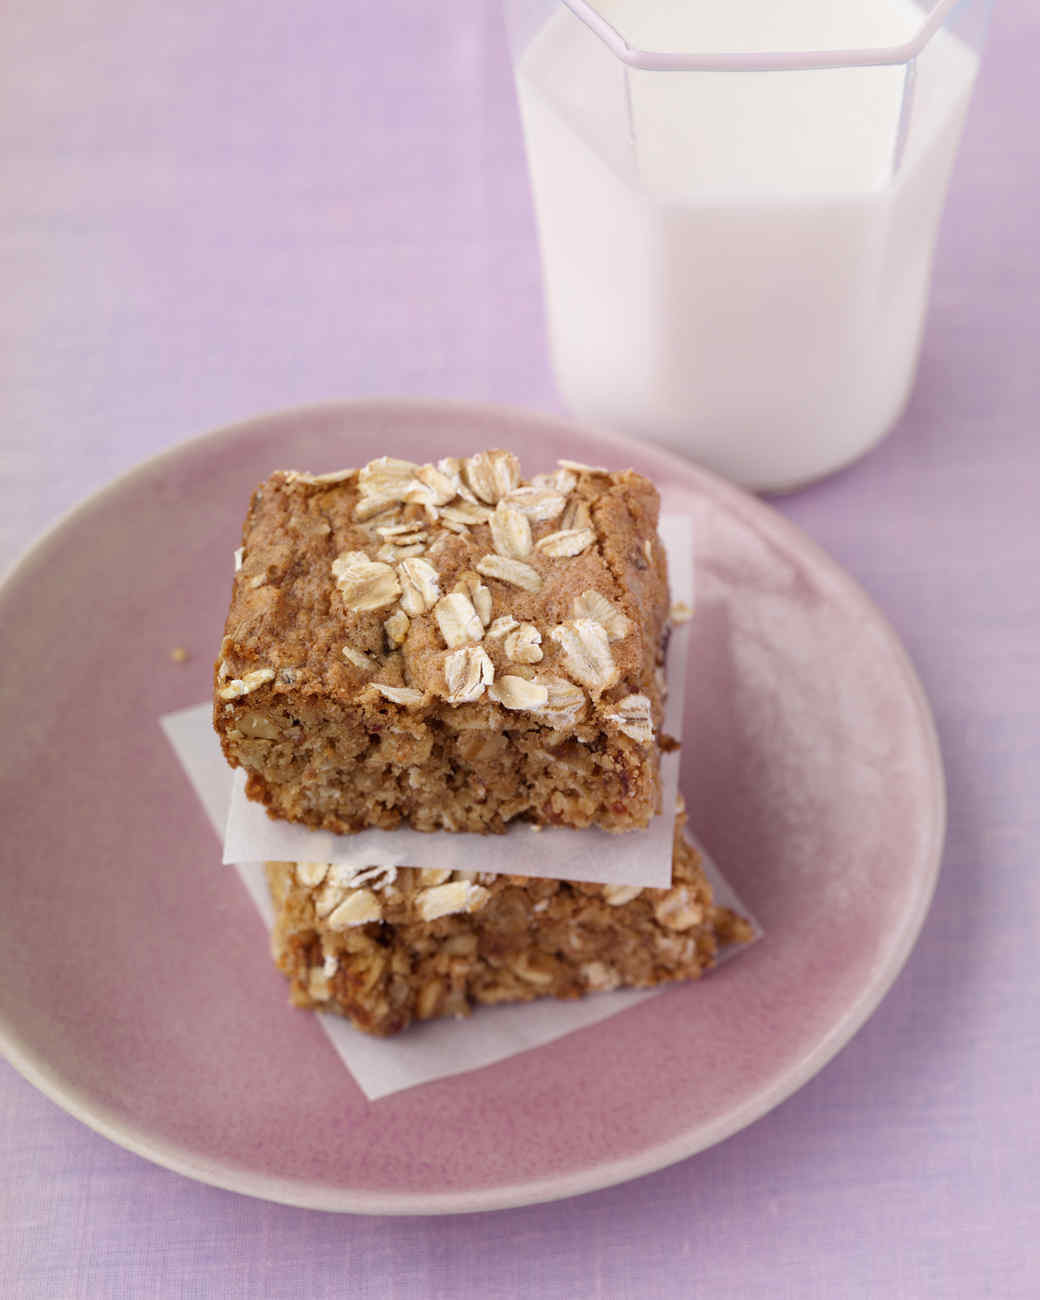 Martha Stewart Healthy Oatmeal Cookies  Our Favorite Oatmeal Cookie Recipes